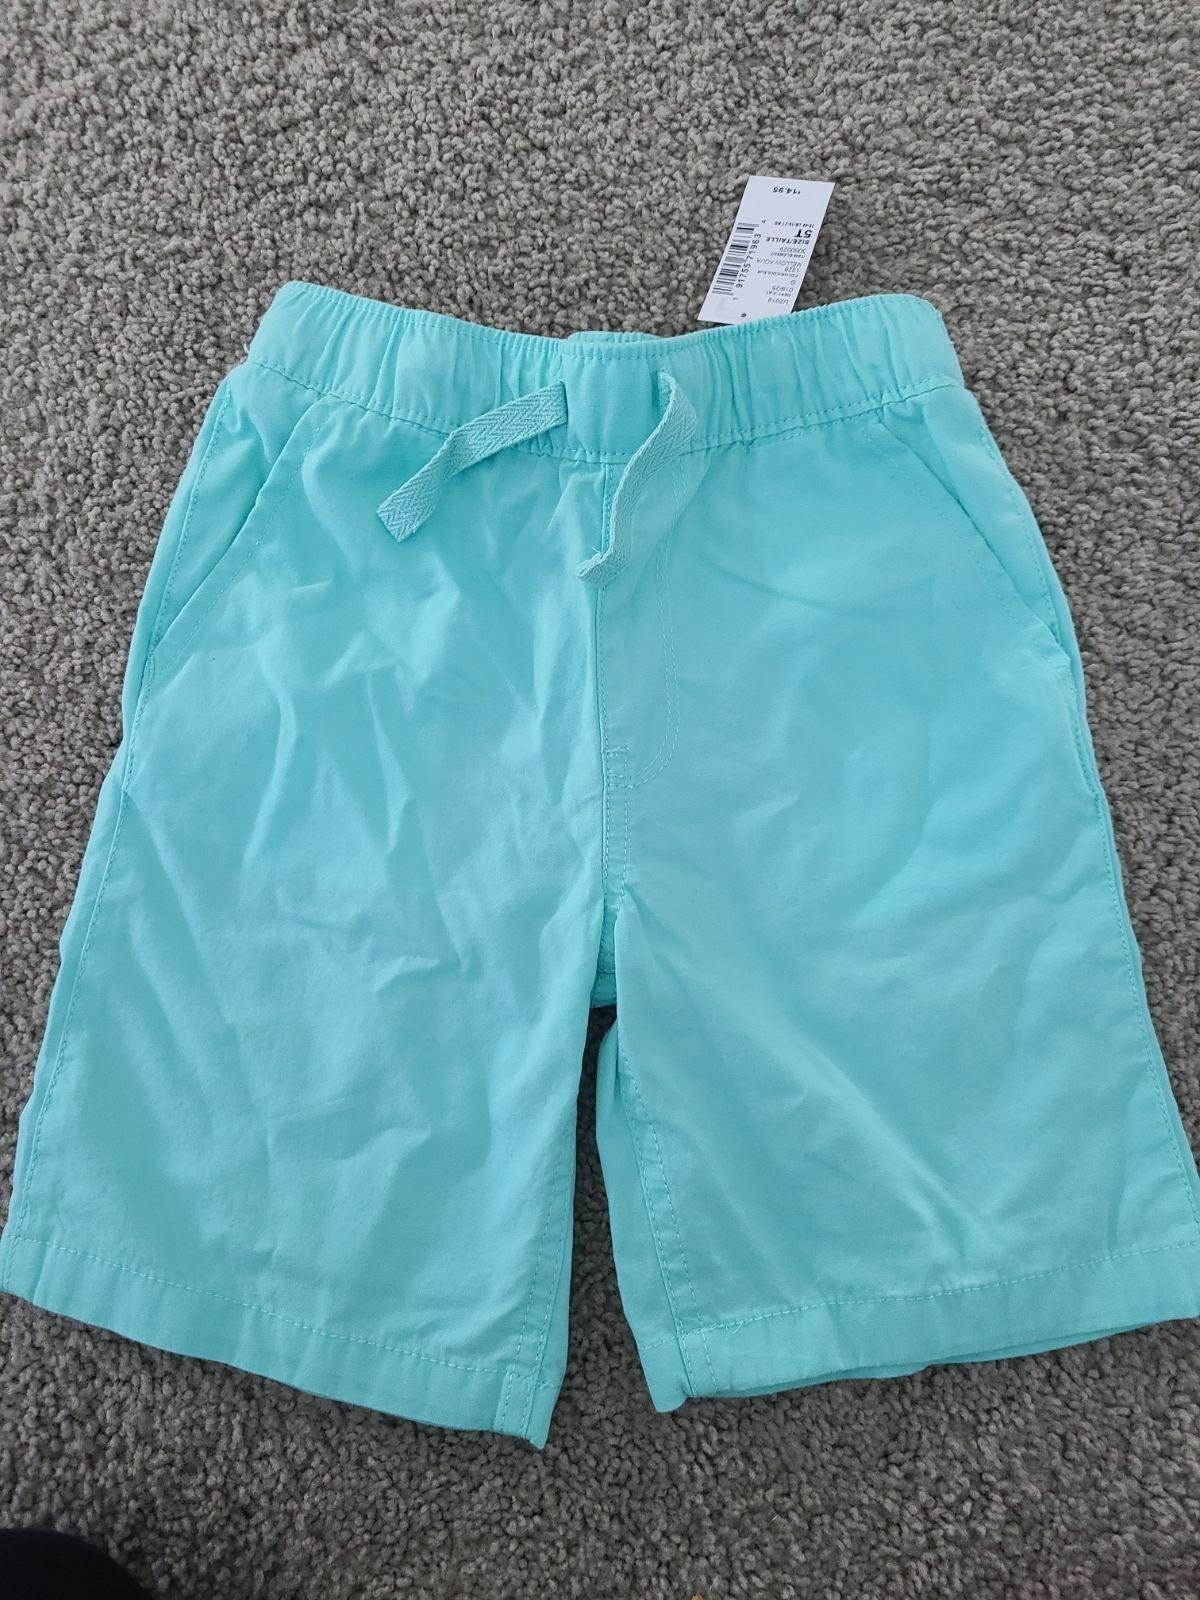 5t dress shorts nwt boy mint